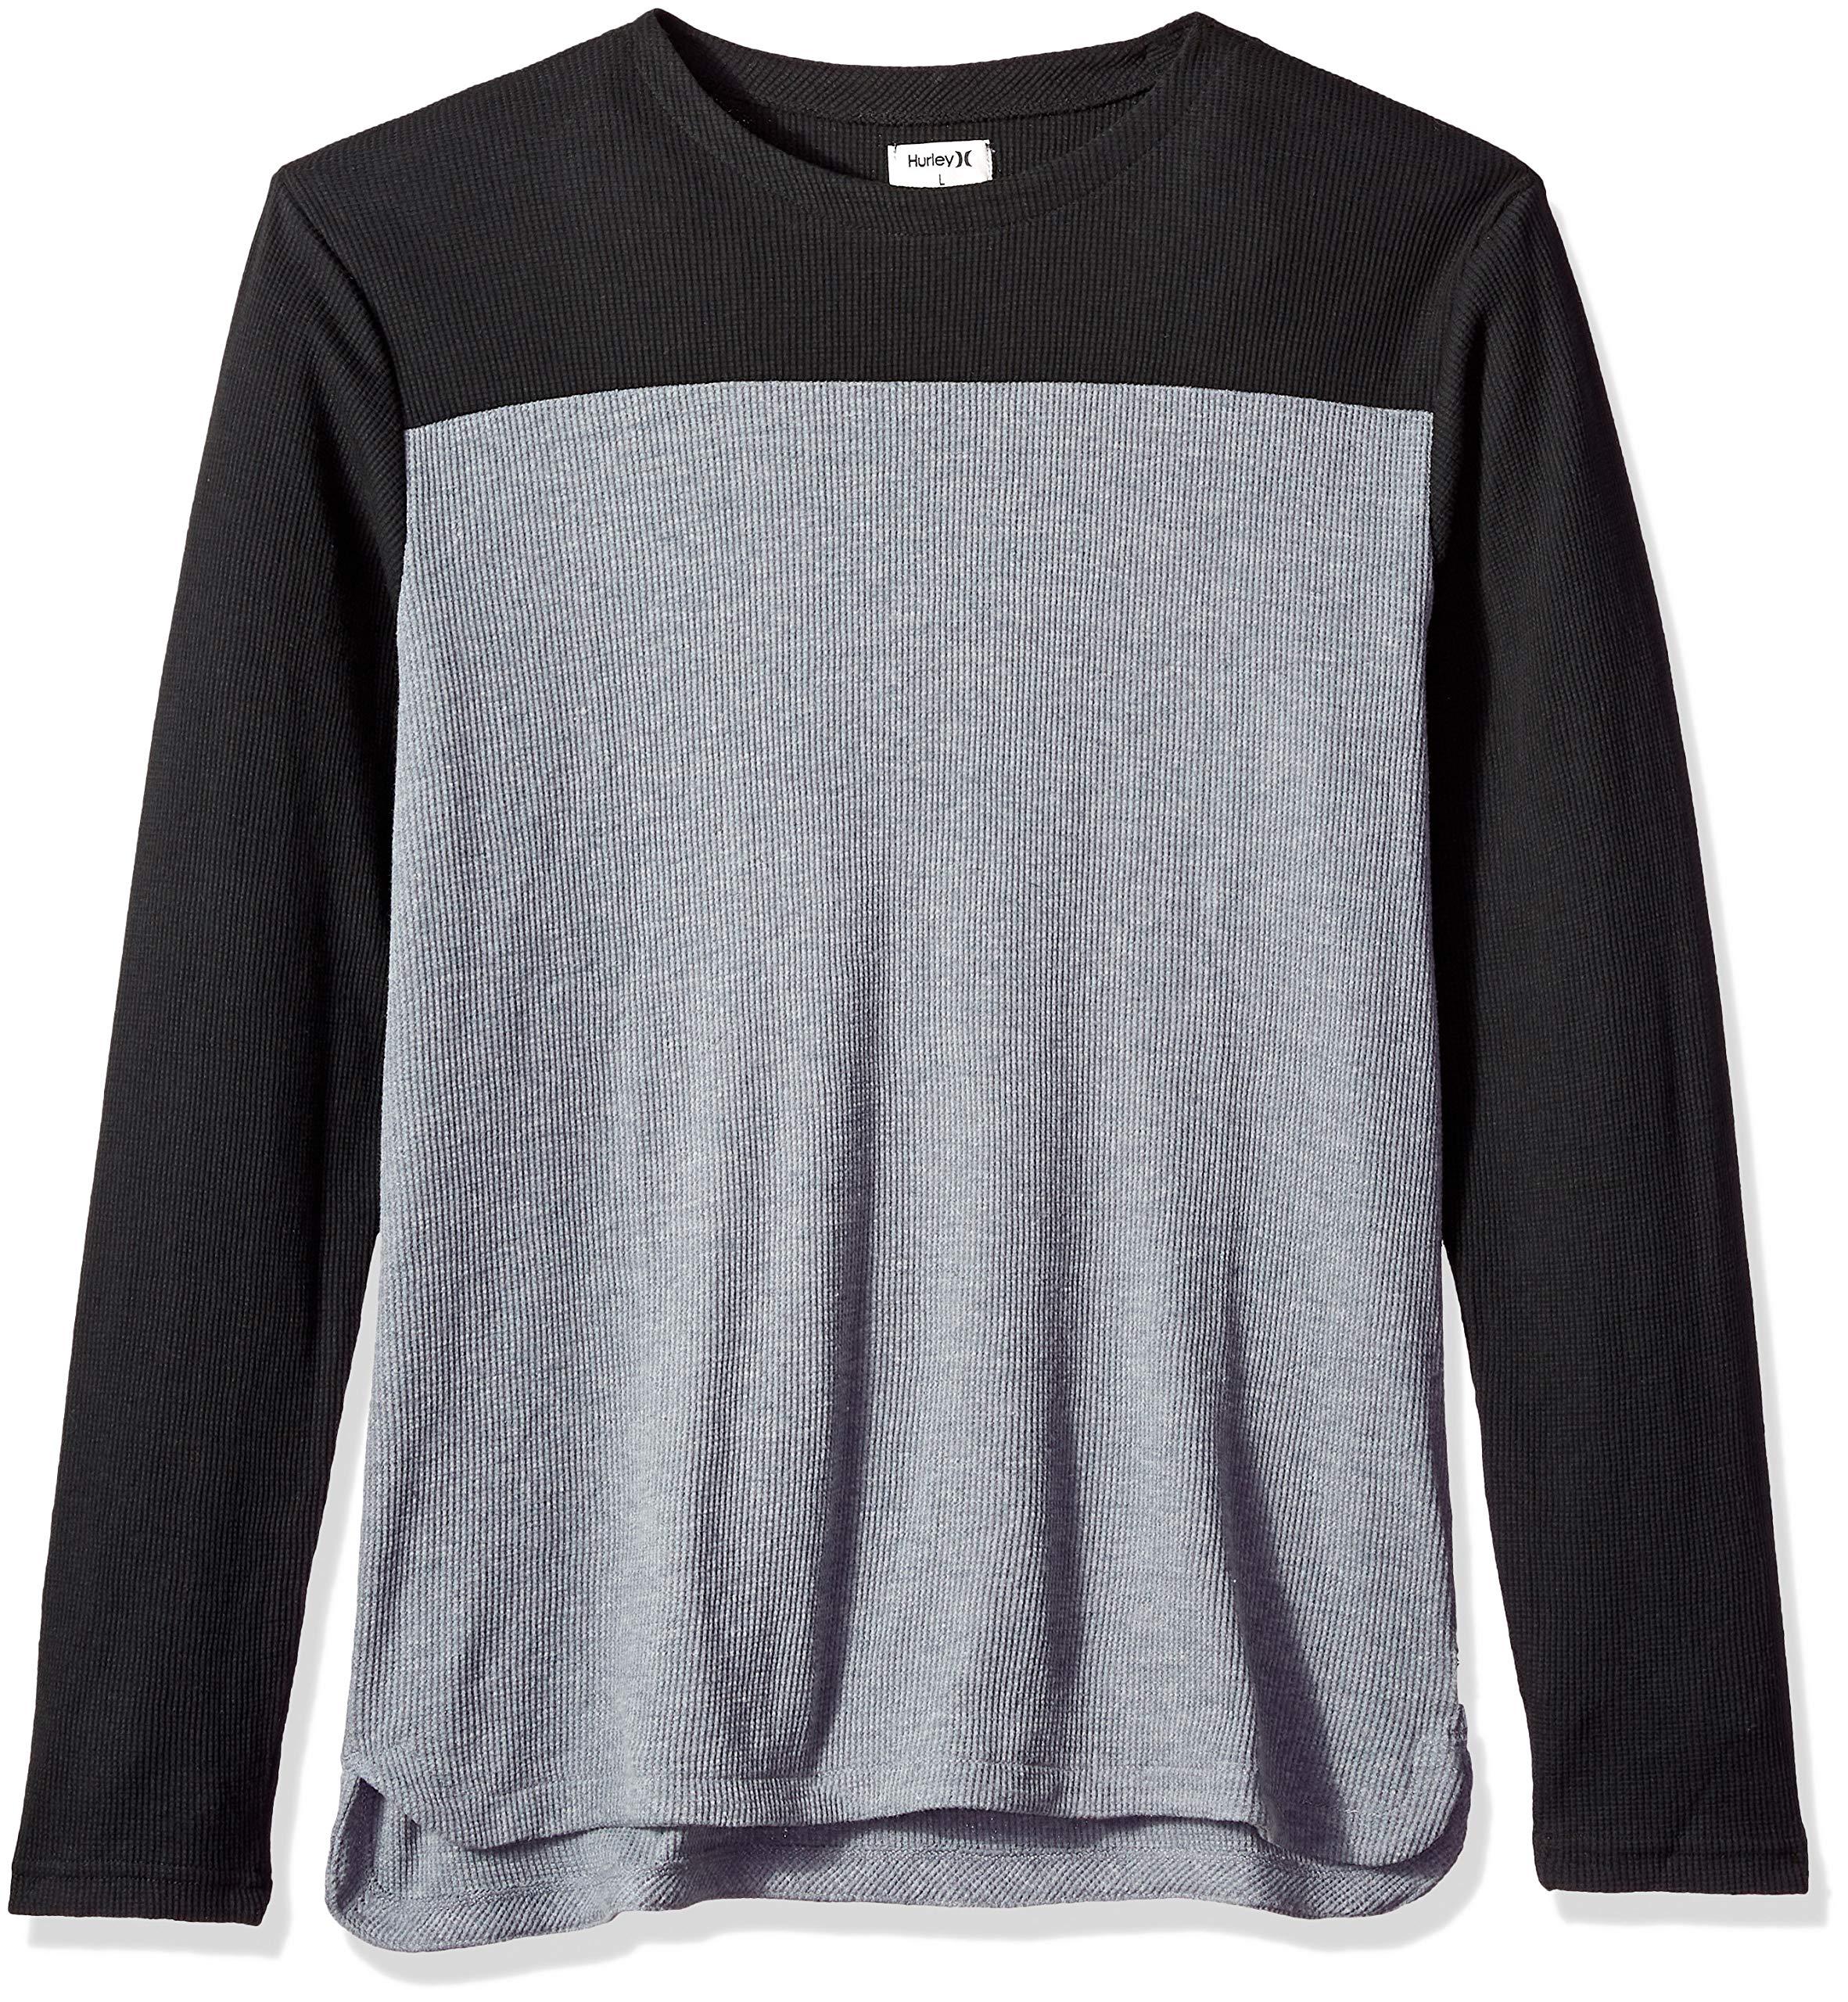 Hurley Men's Color Blocked Thermal Long Sleeve Tshirt